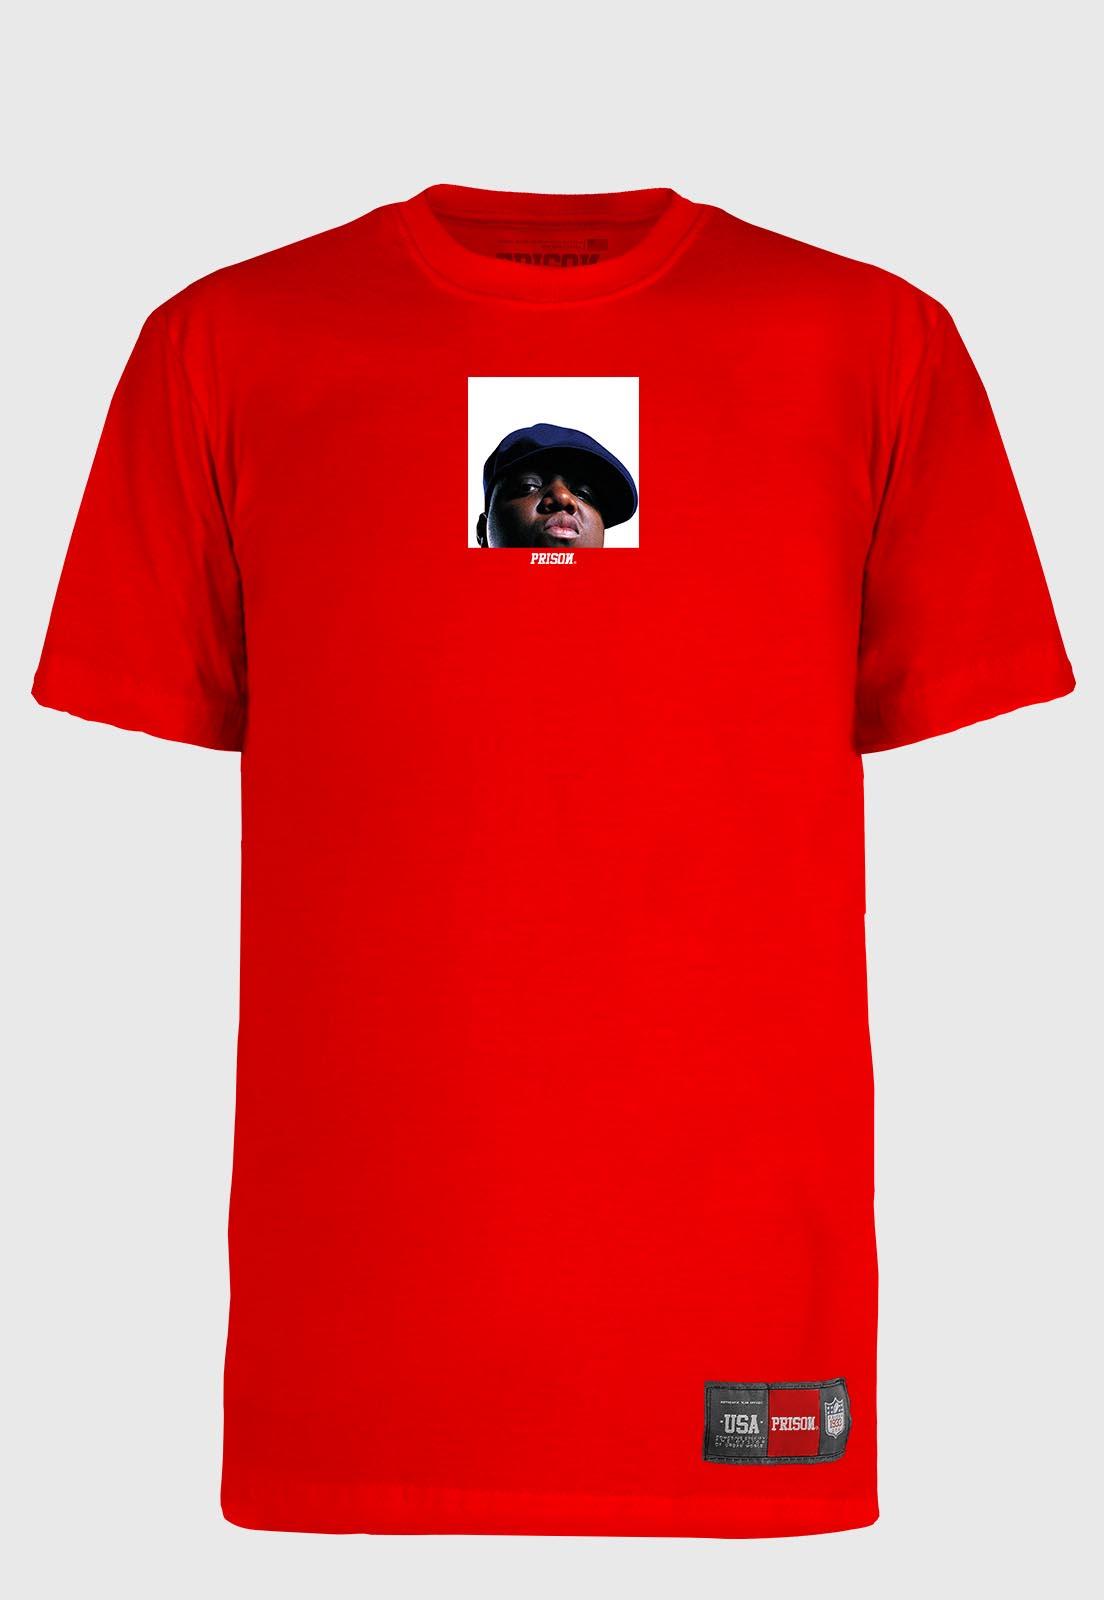 Camiseta Streetwear Prison The Notorious Big